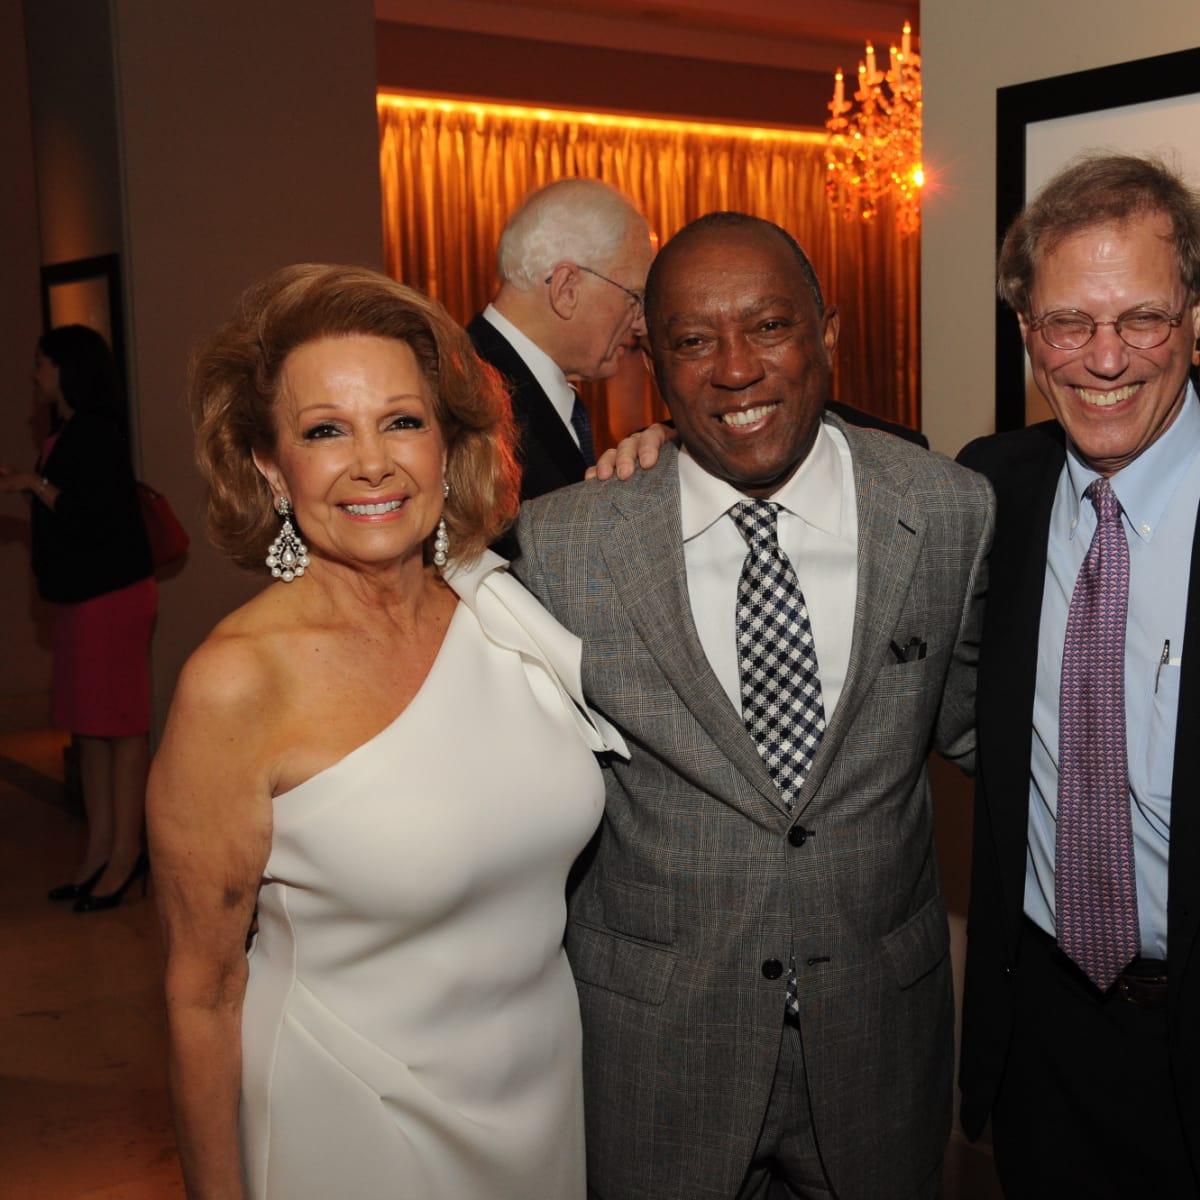 Houston Arts Alliance dinner 5/16, Philamena Baird, Mayor Sylvester Turner, Stephen Klineberg